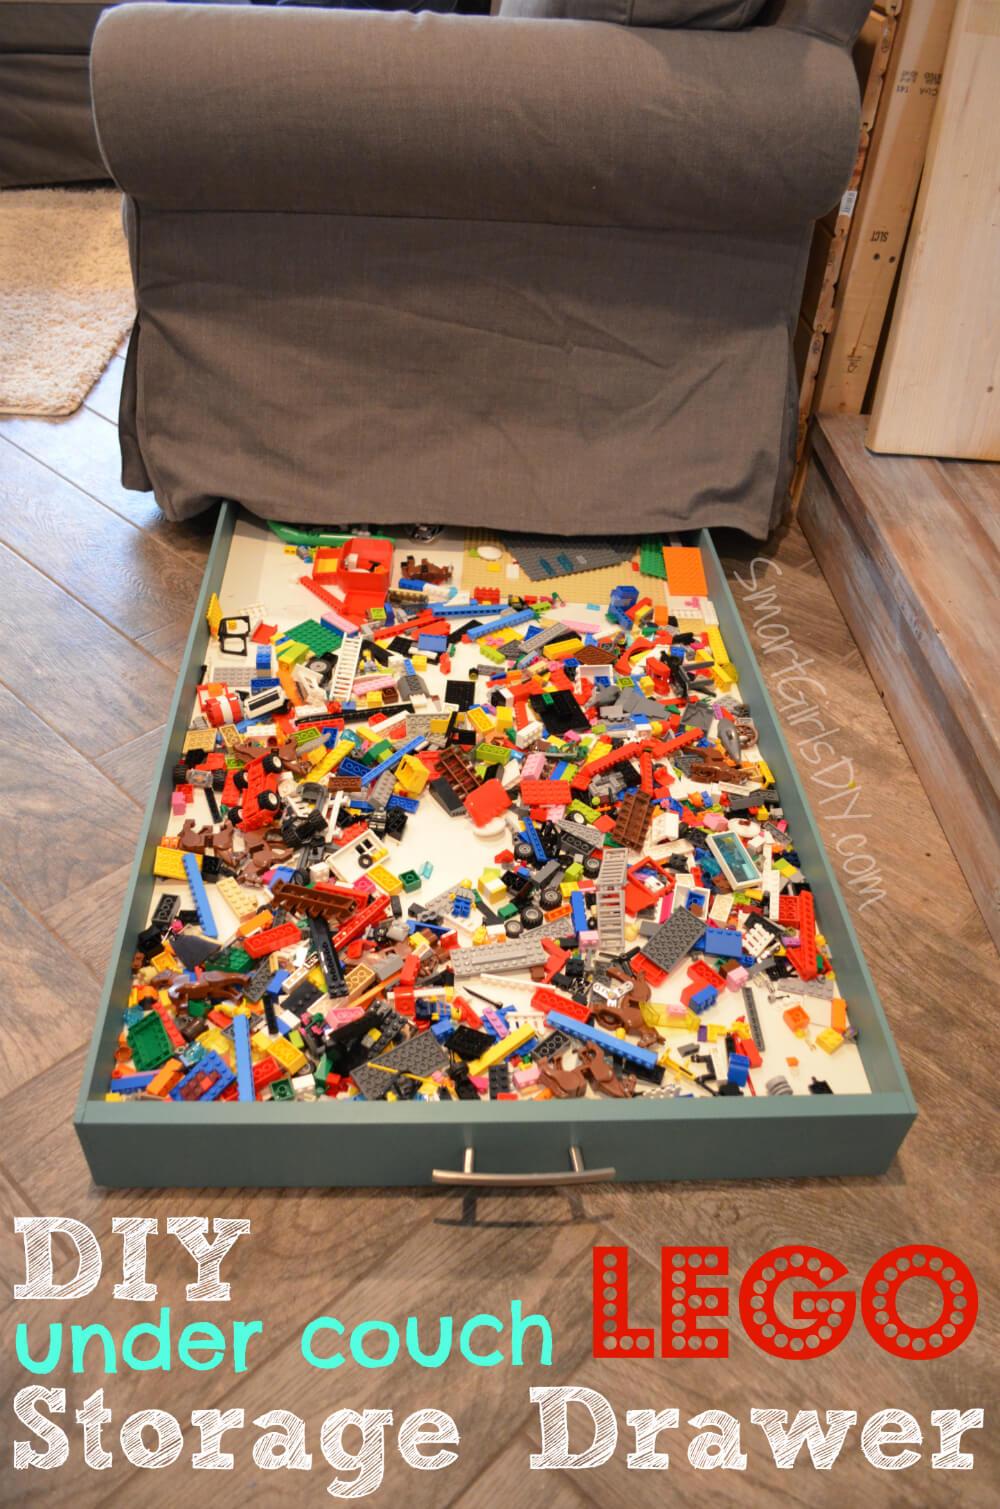 DIY under couch Lego storage drawer by SmartGirlsDIY